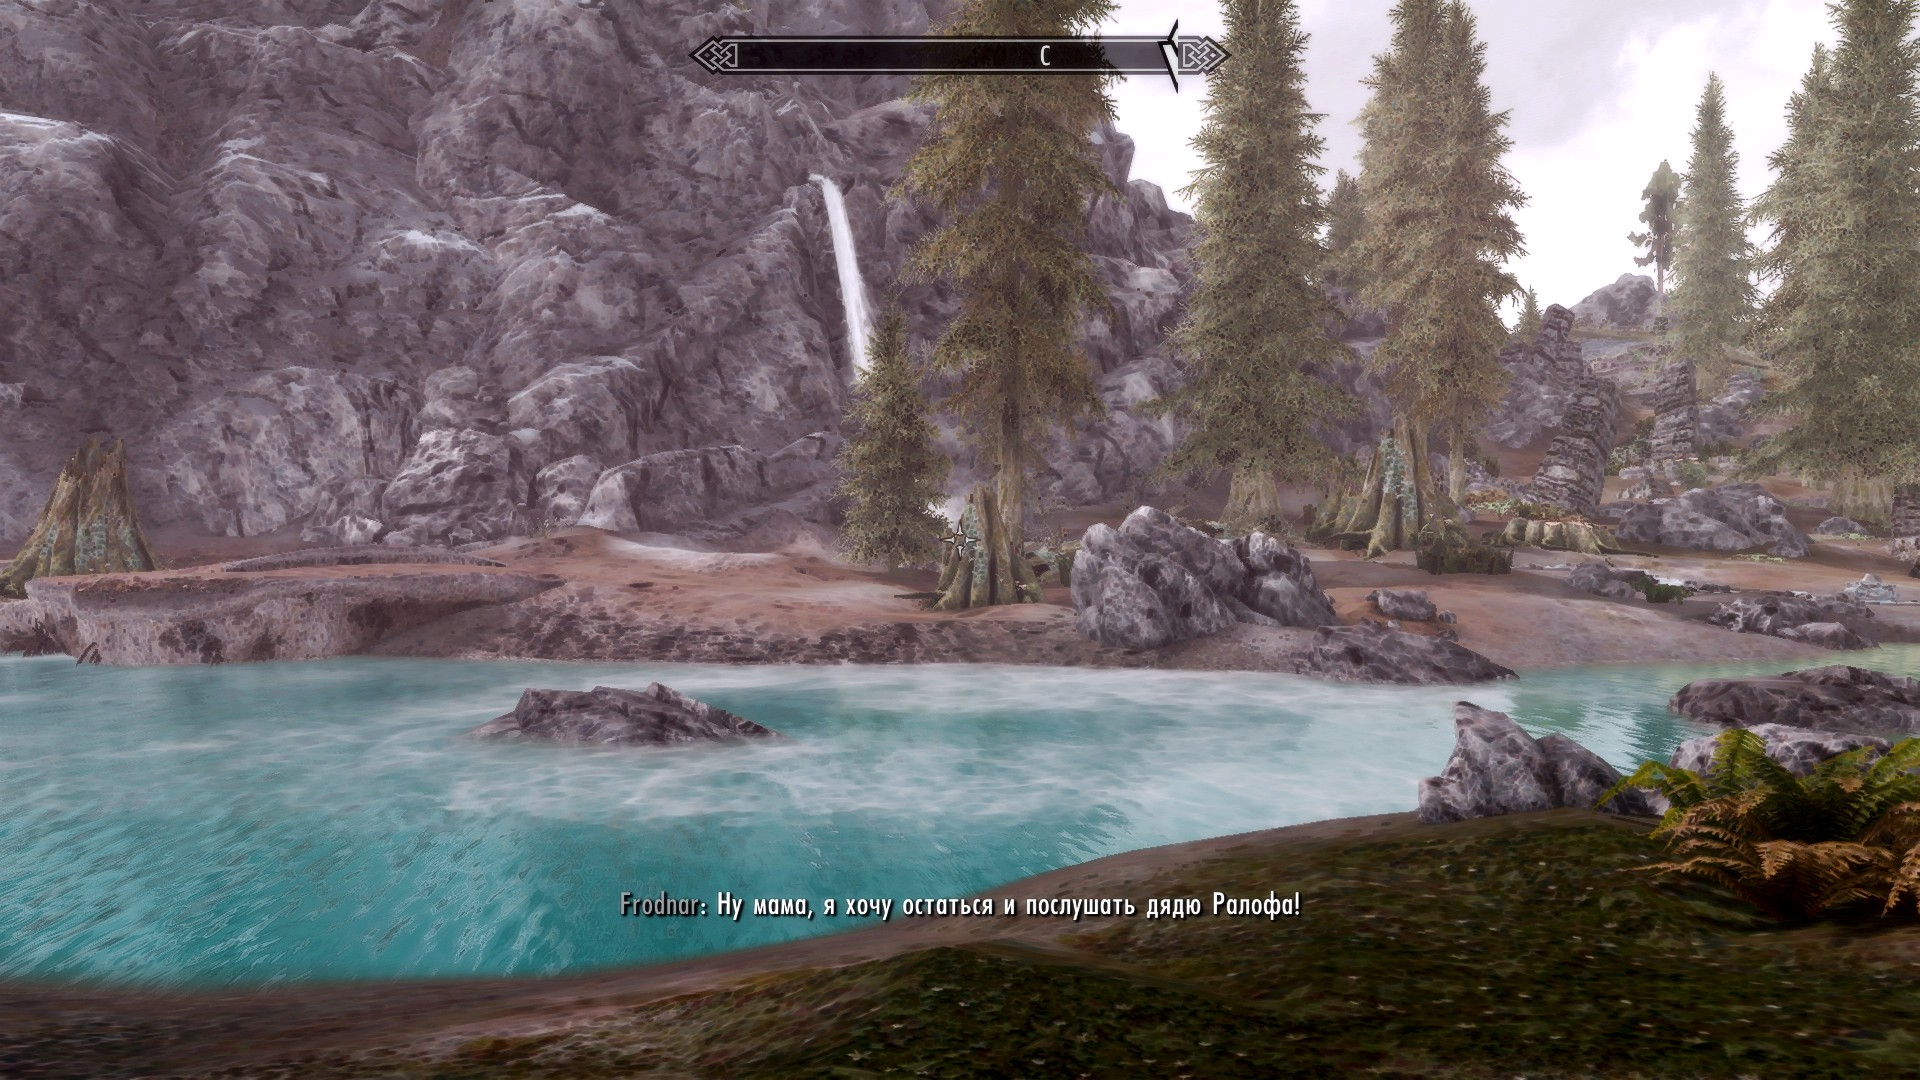 20171002112148_1.jpg - Elder Scrolls 5: Skyrim, the